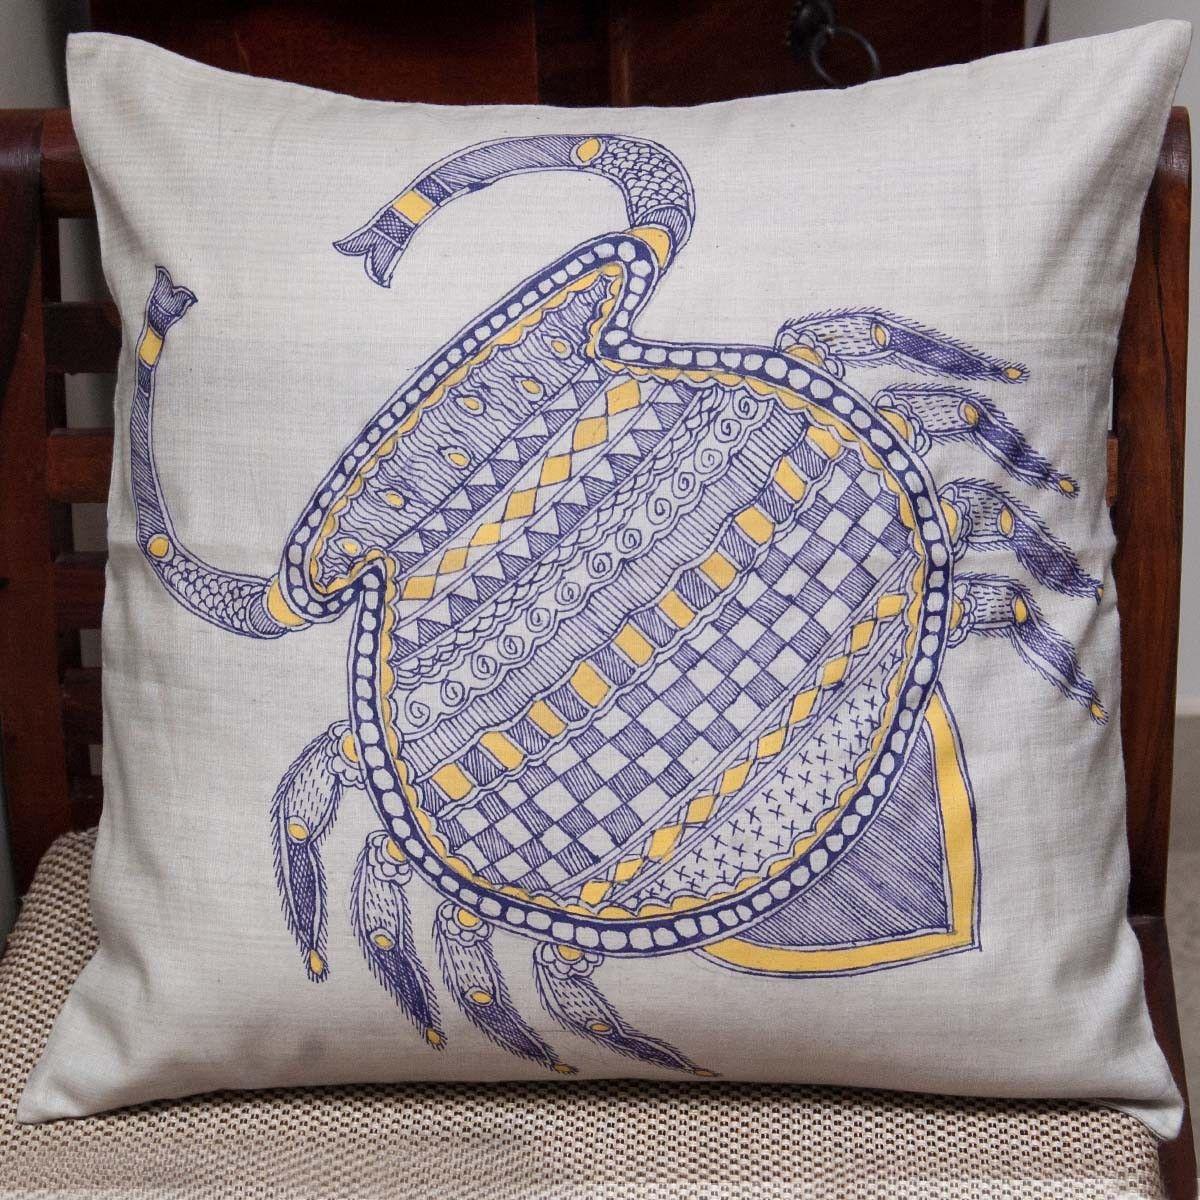 Cancer Zodiac Sign Cushion Cover - 16 X 16 Inch